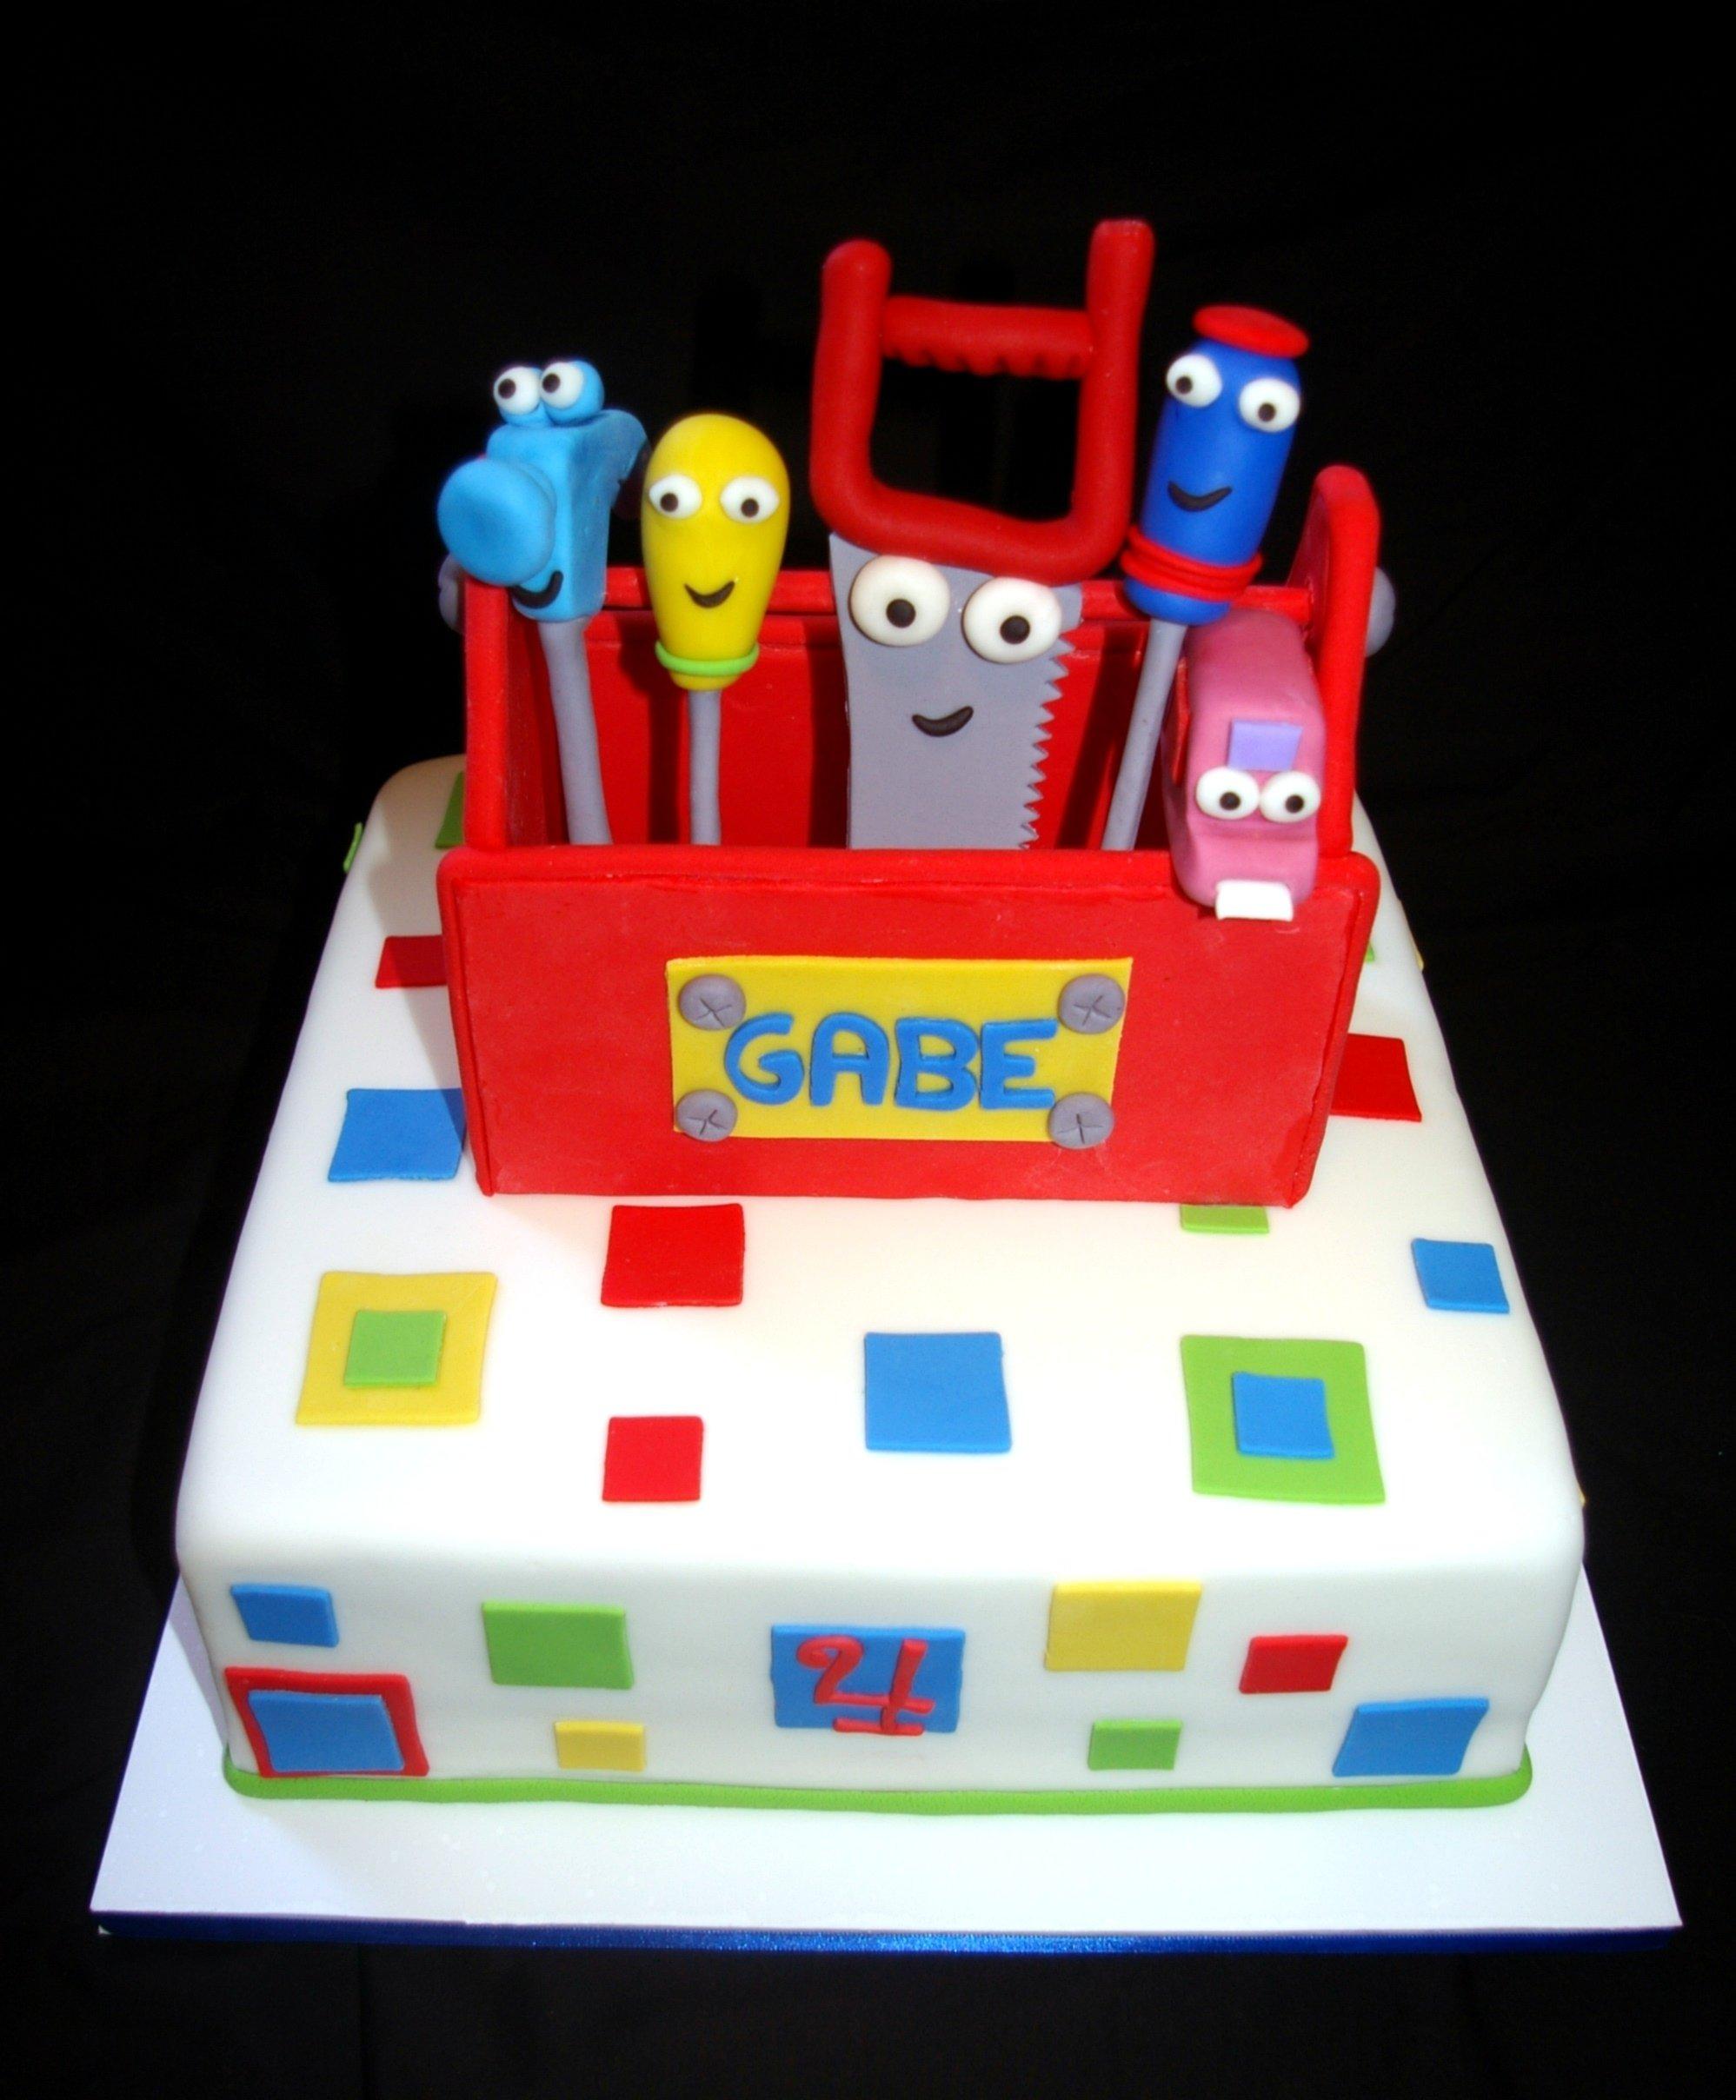 10 Amazing Handy Manny Birthday Party Ideas handy manny birthday cake kids party ideas pinterest birthday 2020